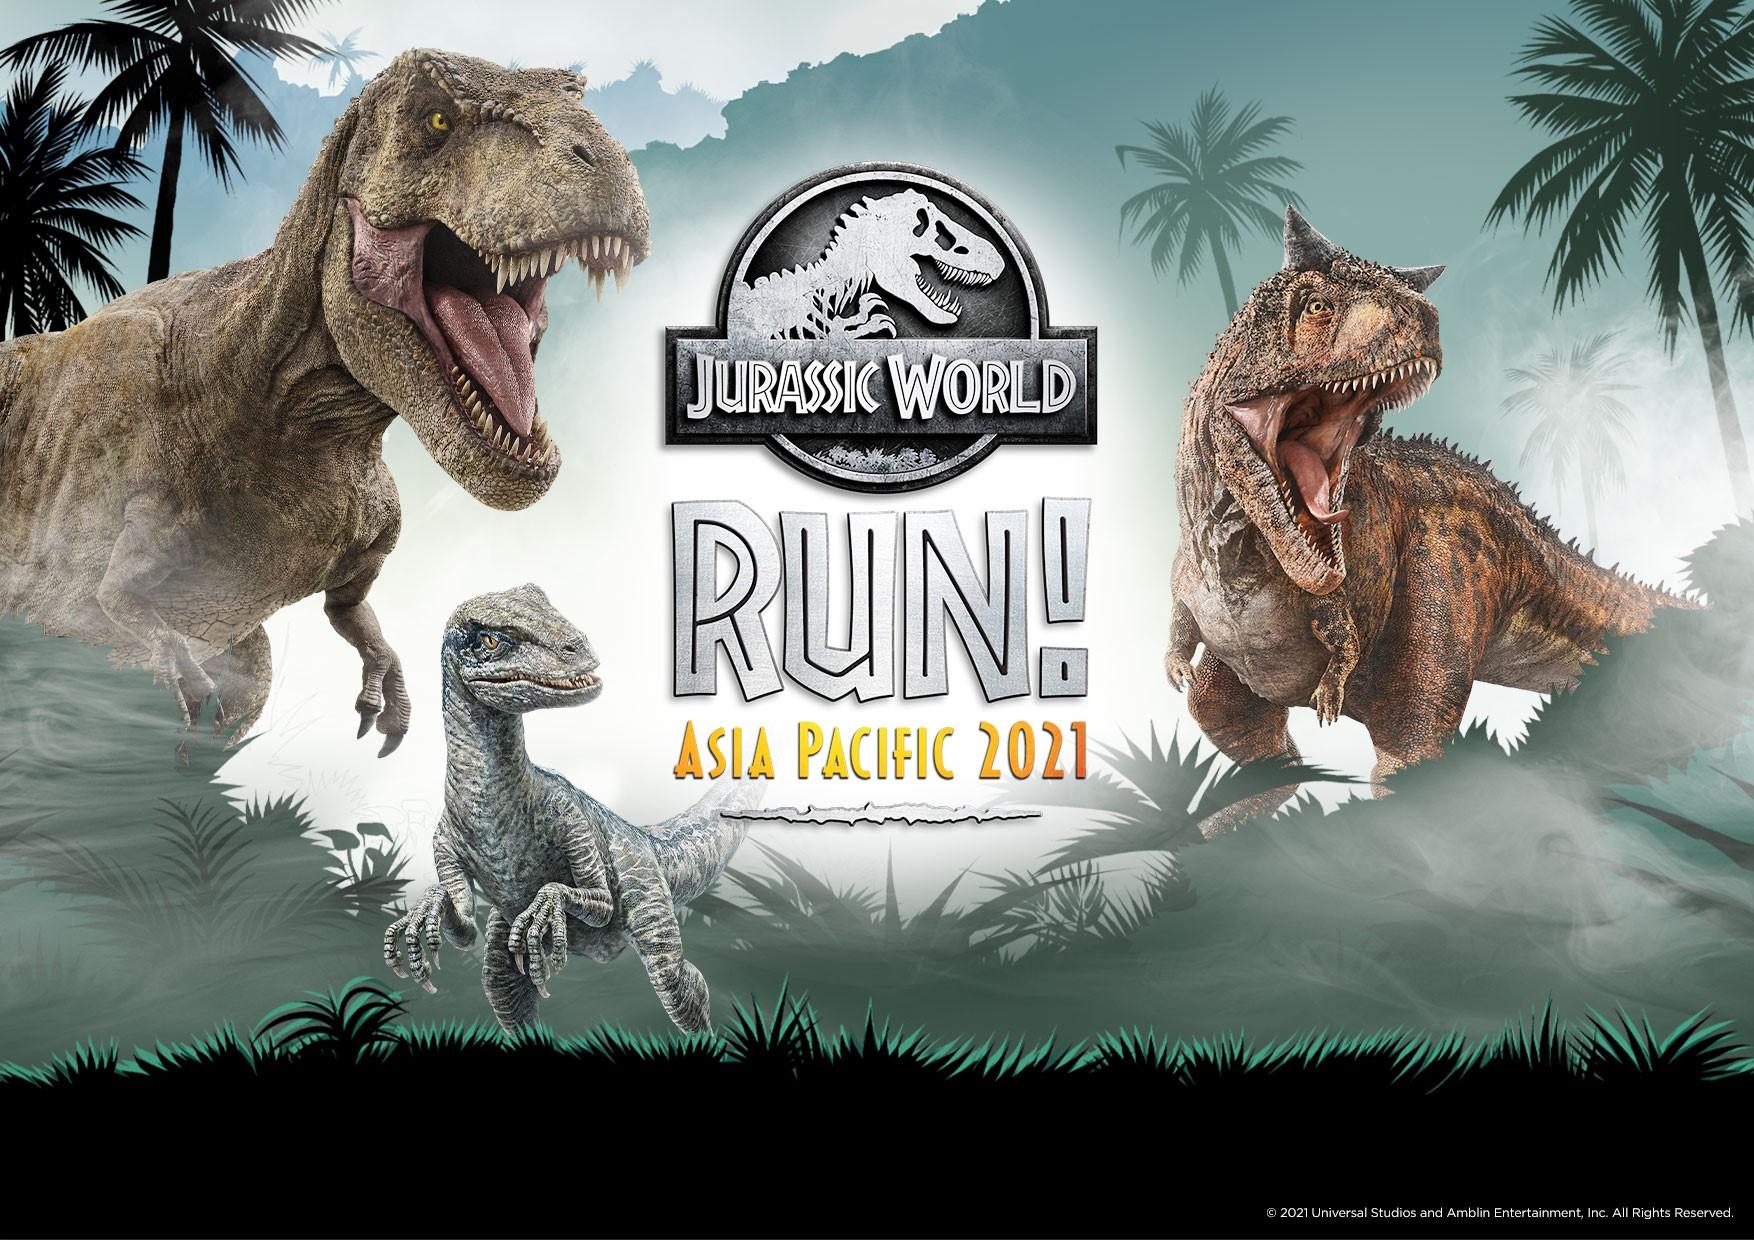 Jurassic World RUN Asia Pacific 2021: First-Ever Jurassic World Virtual Run in Asia Pacific